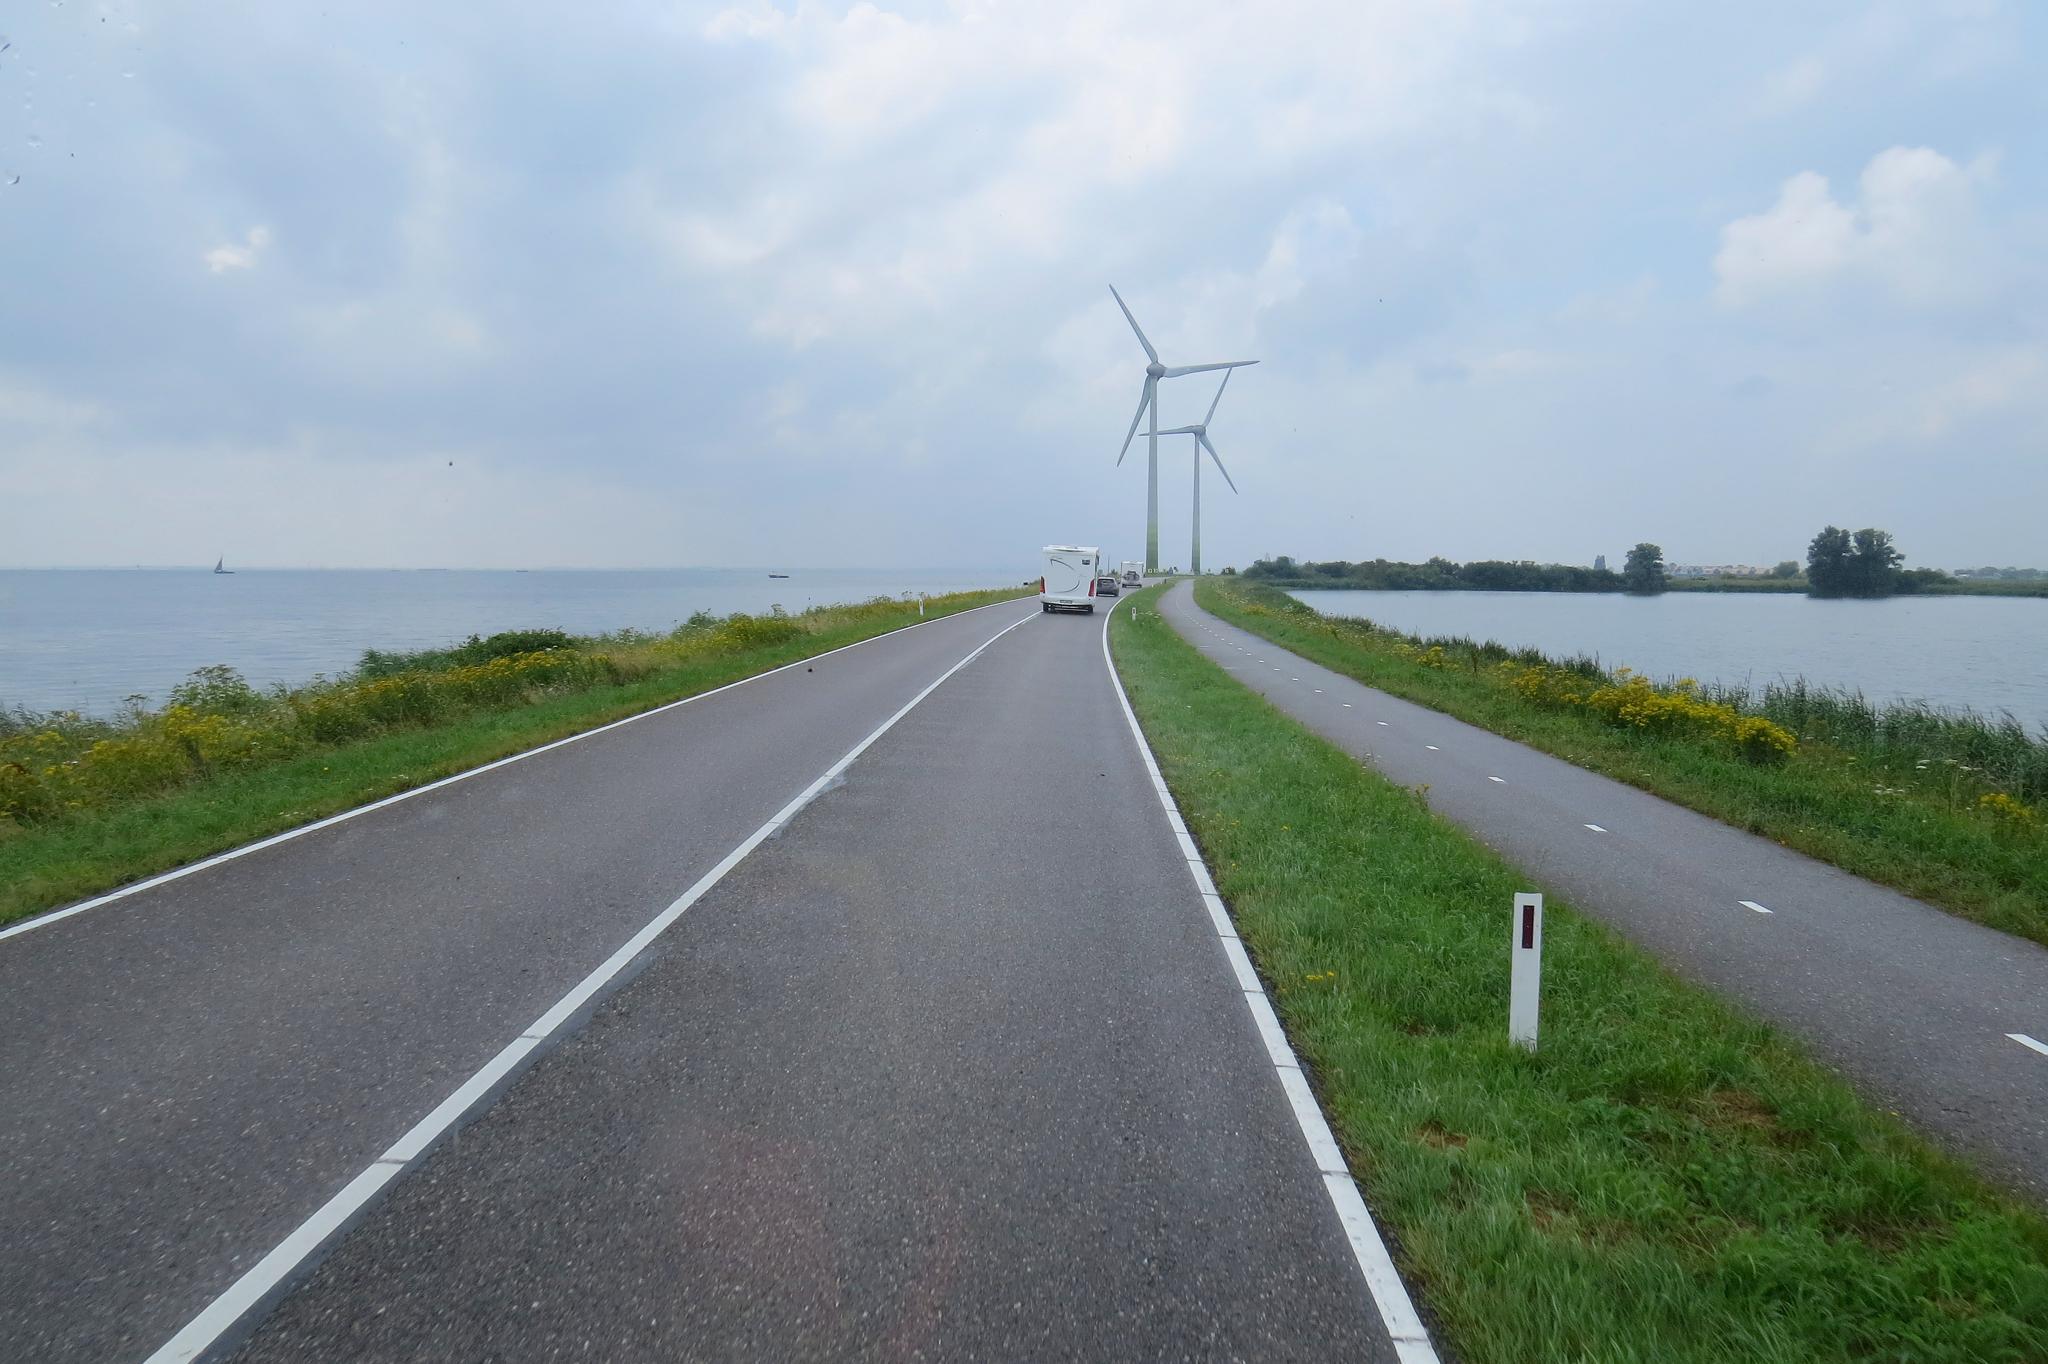 miasteczka w Holandii droga do marken